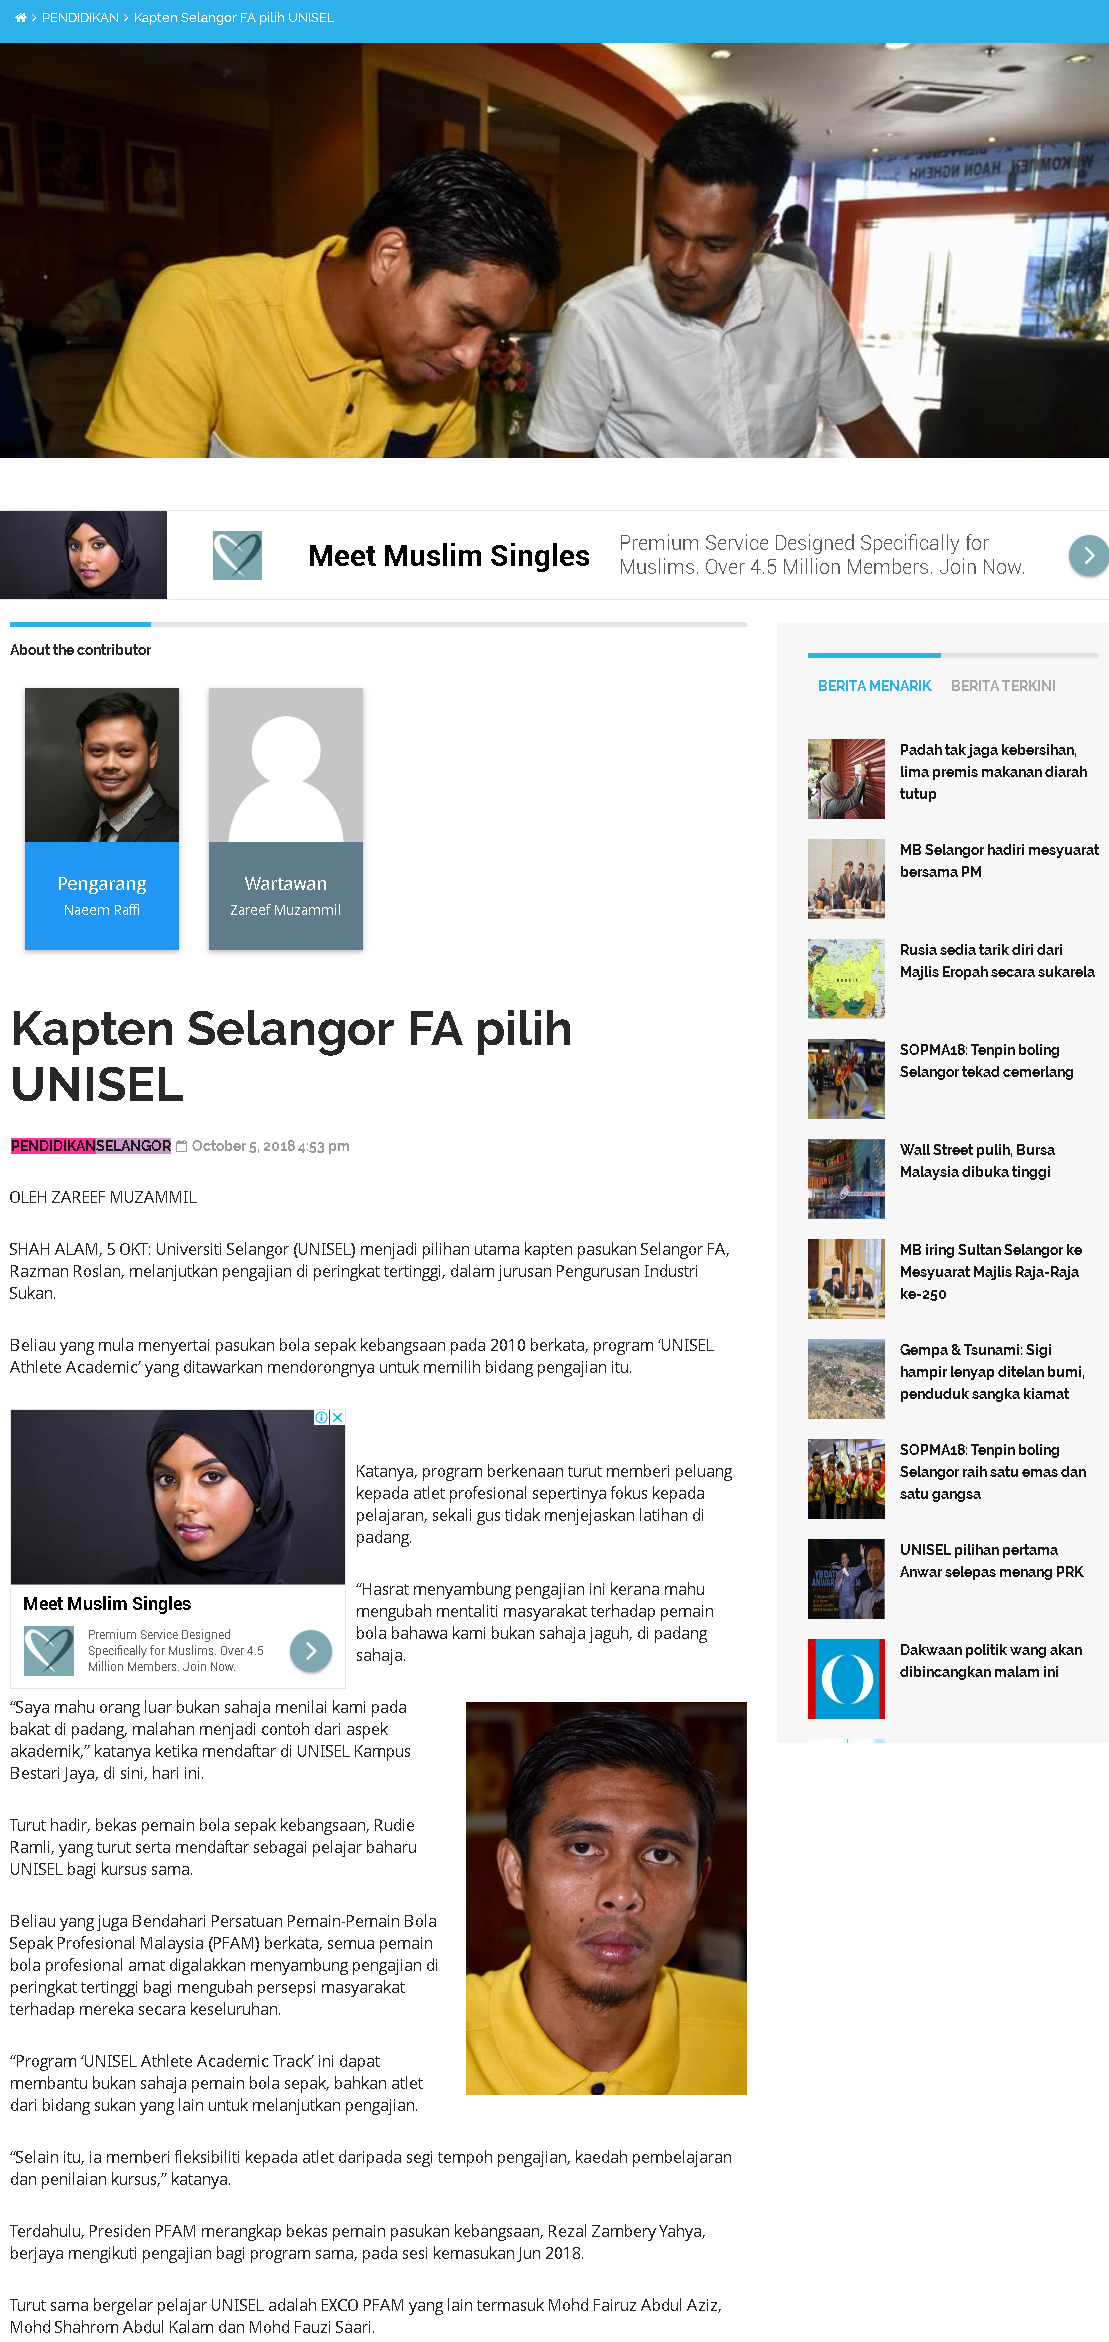 Selangor Kini Online - 5 Oktober 2018